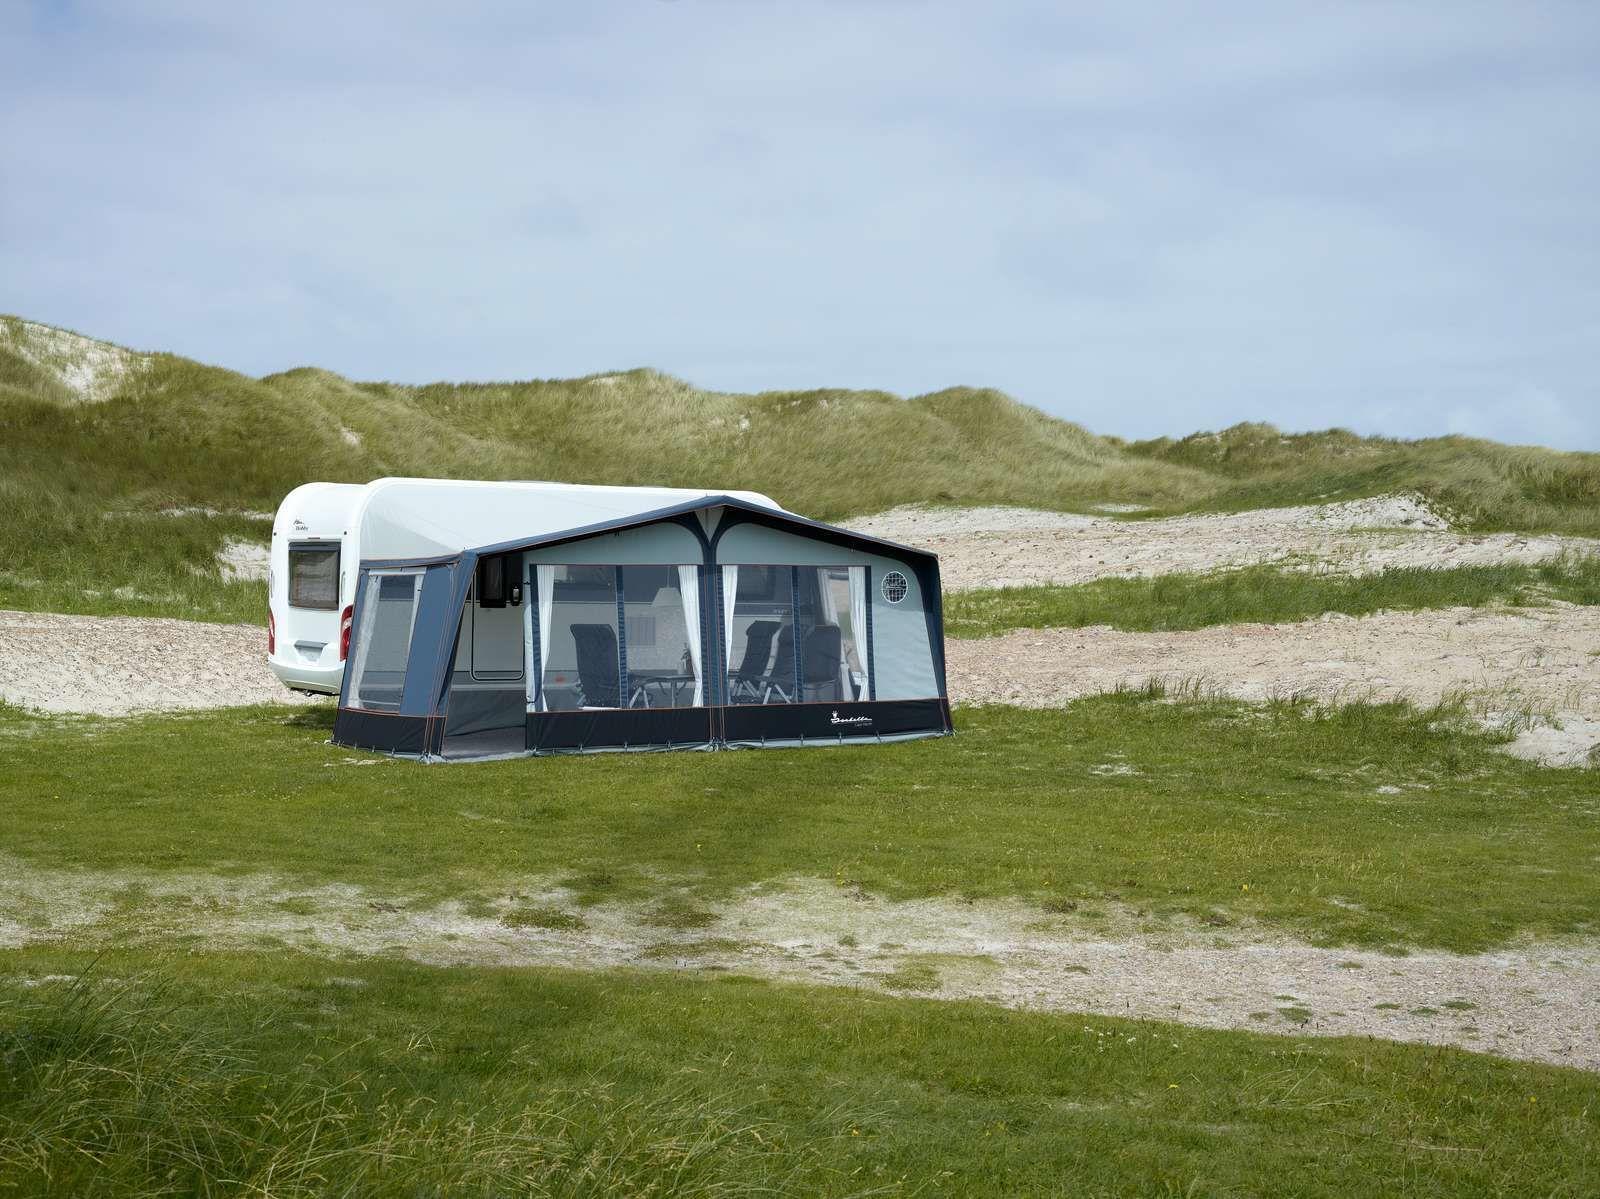 isabella wohnwagenvorzelt capri north g21 m. Black Bedroom Furniture Sets. Home Design Ideas